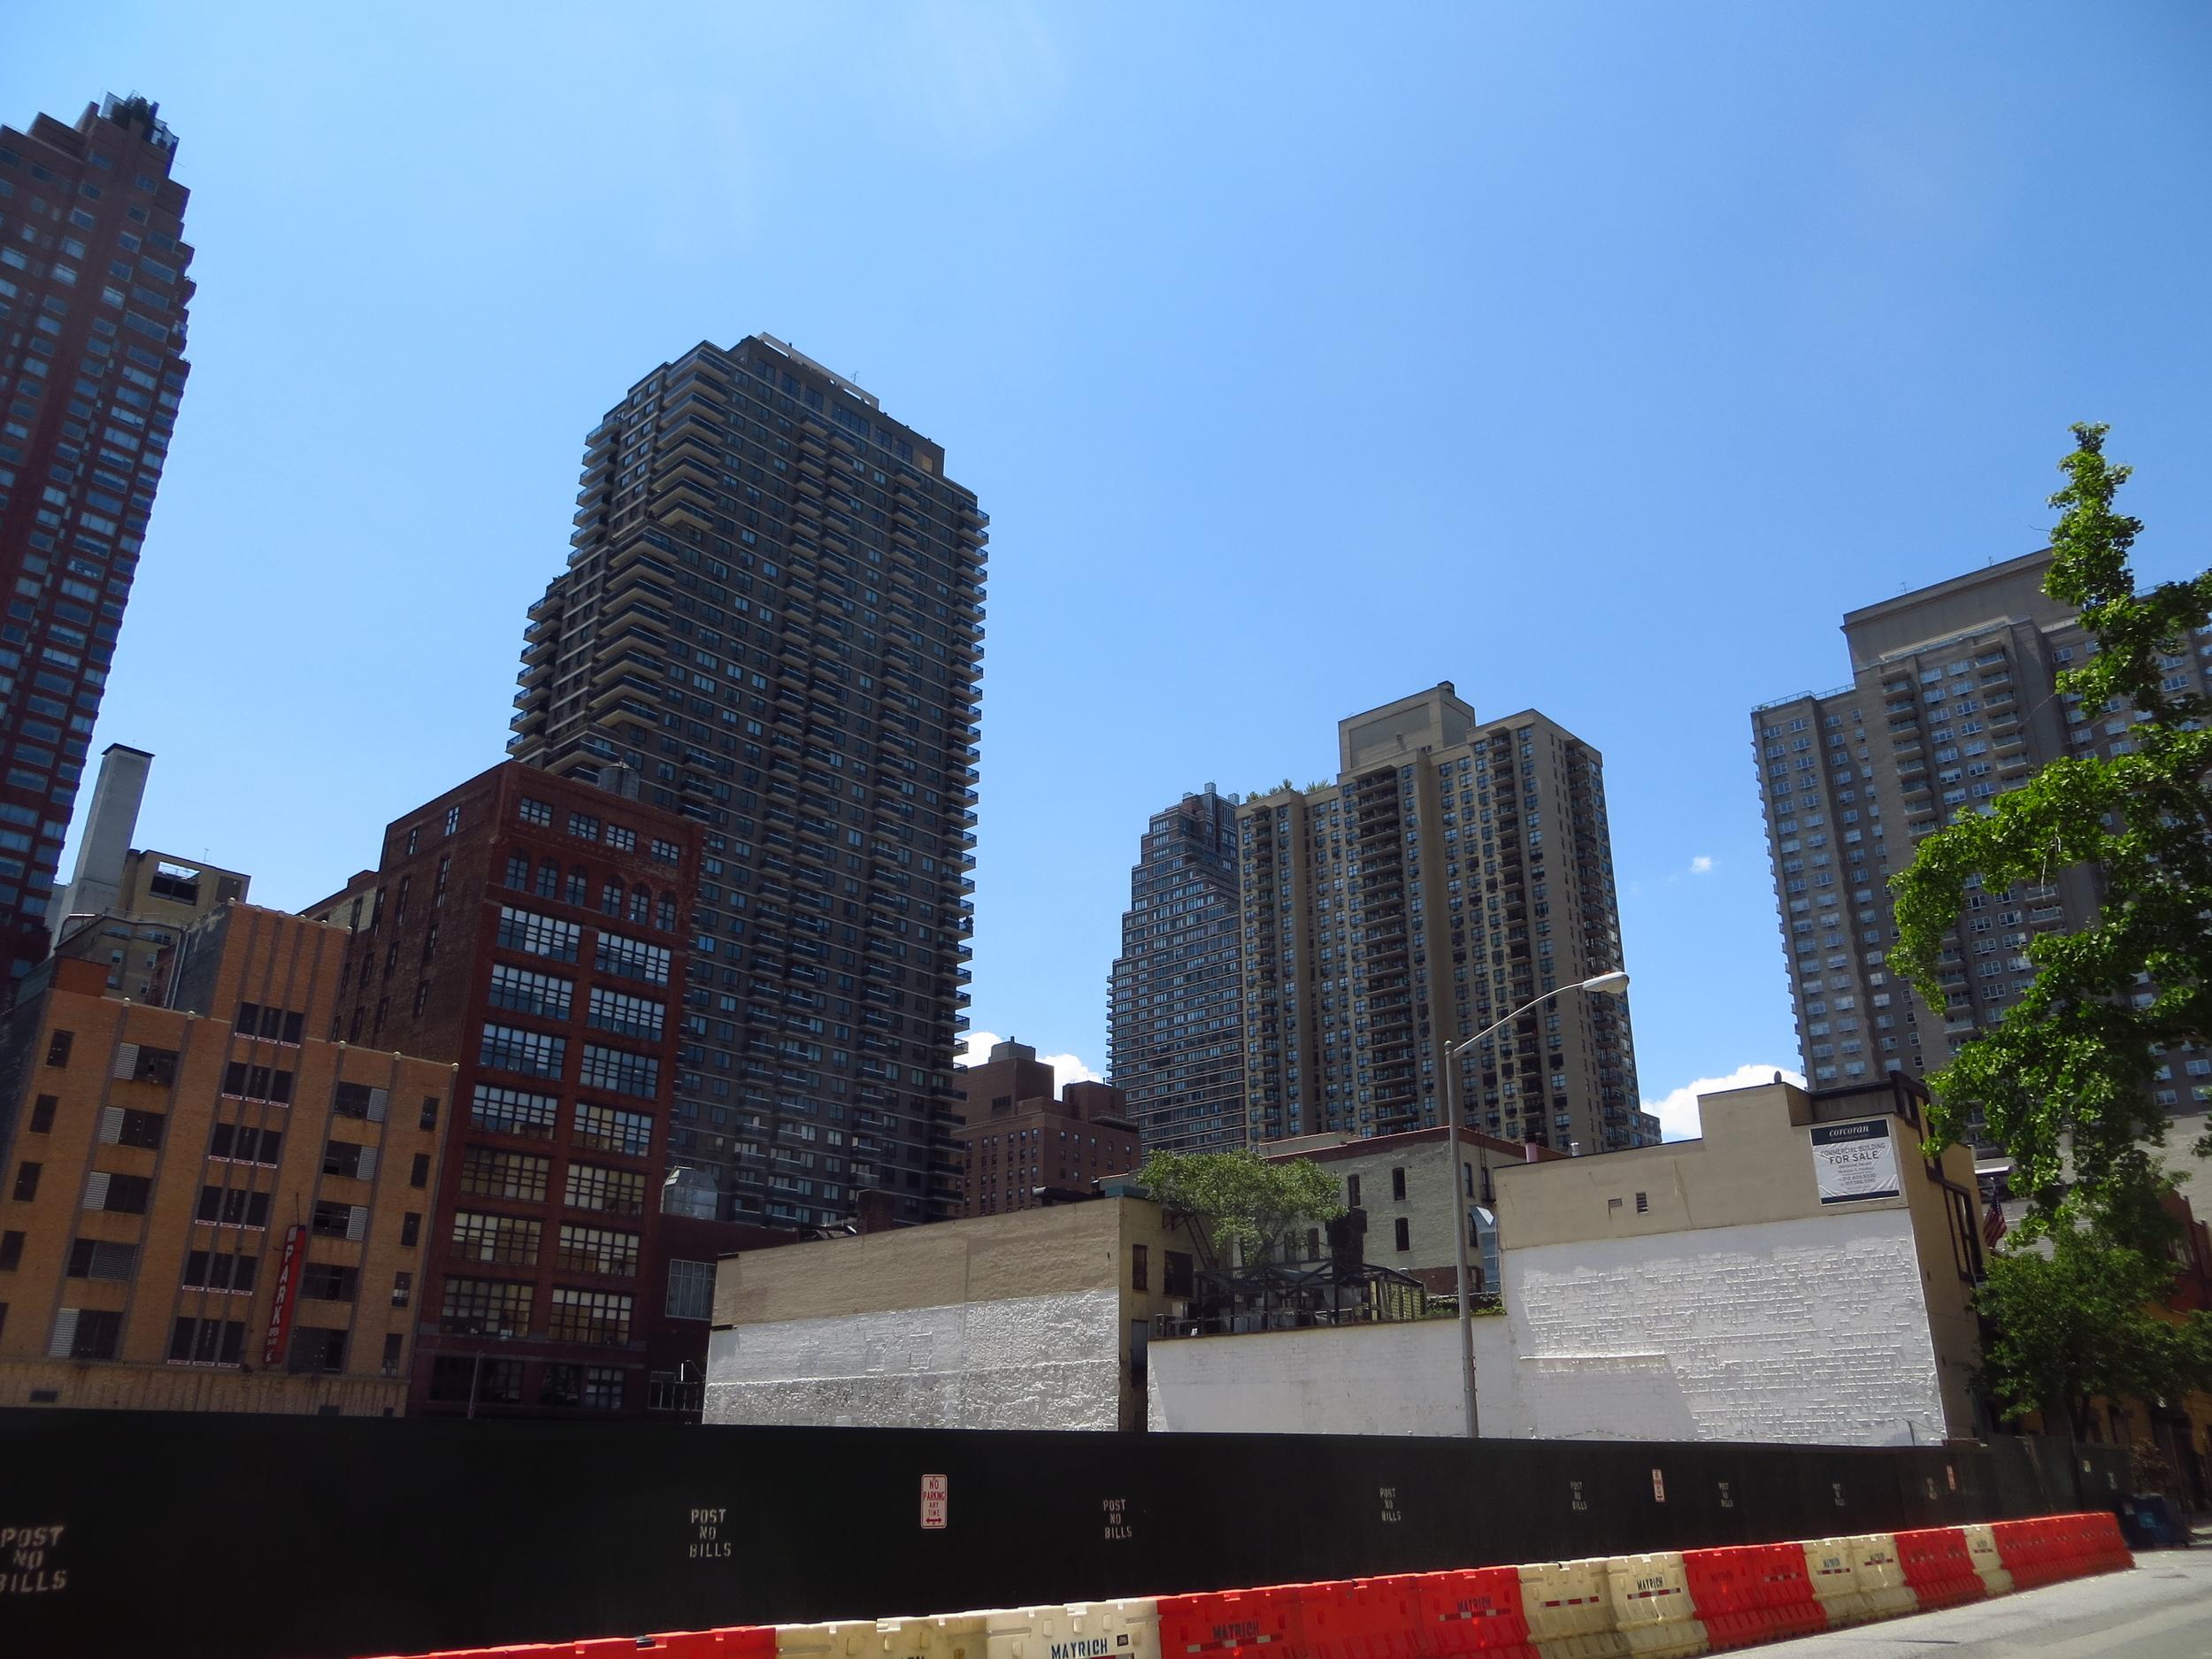 UES apartment buildings